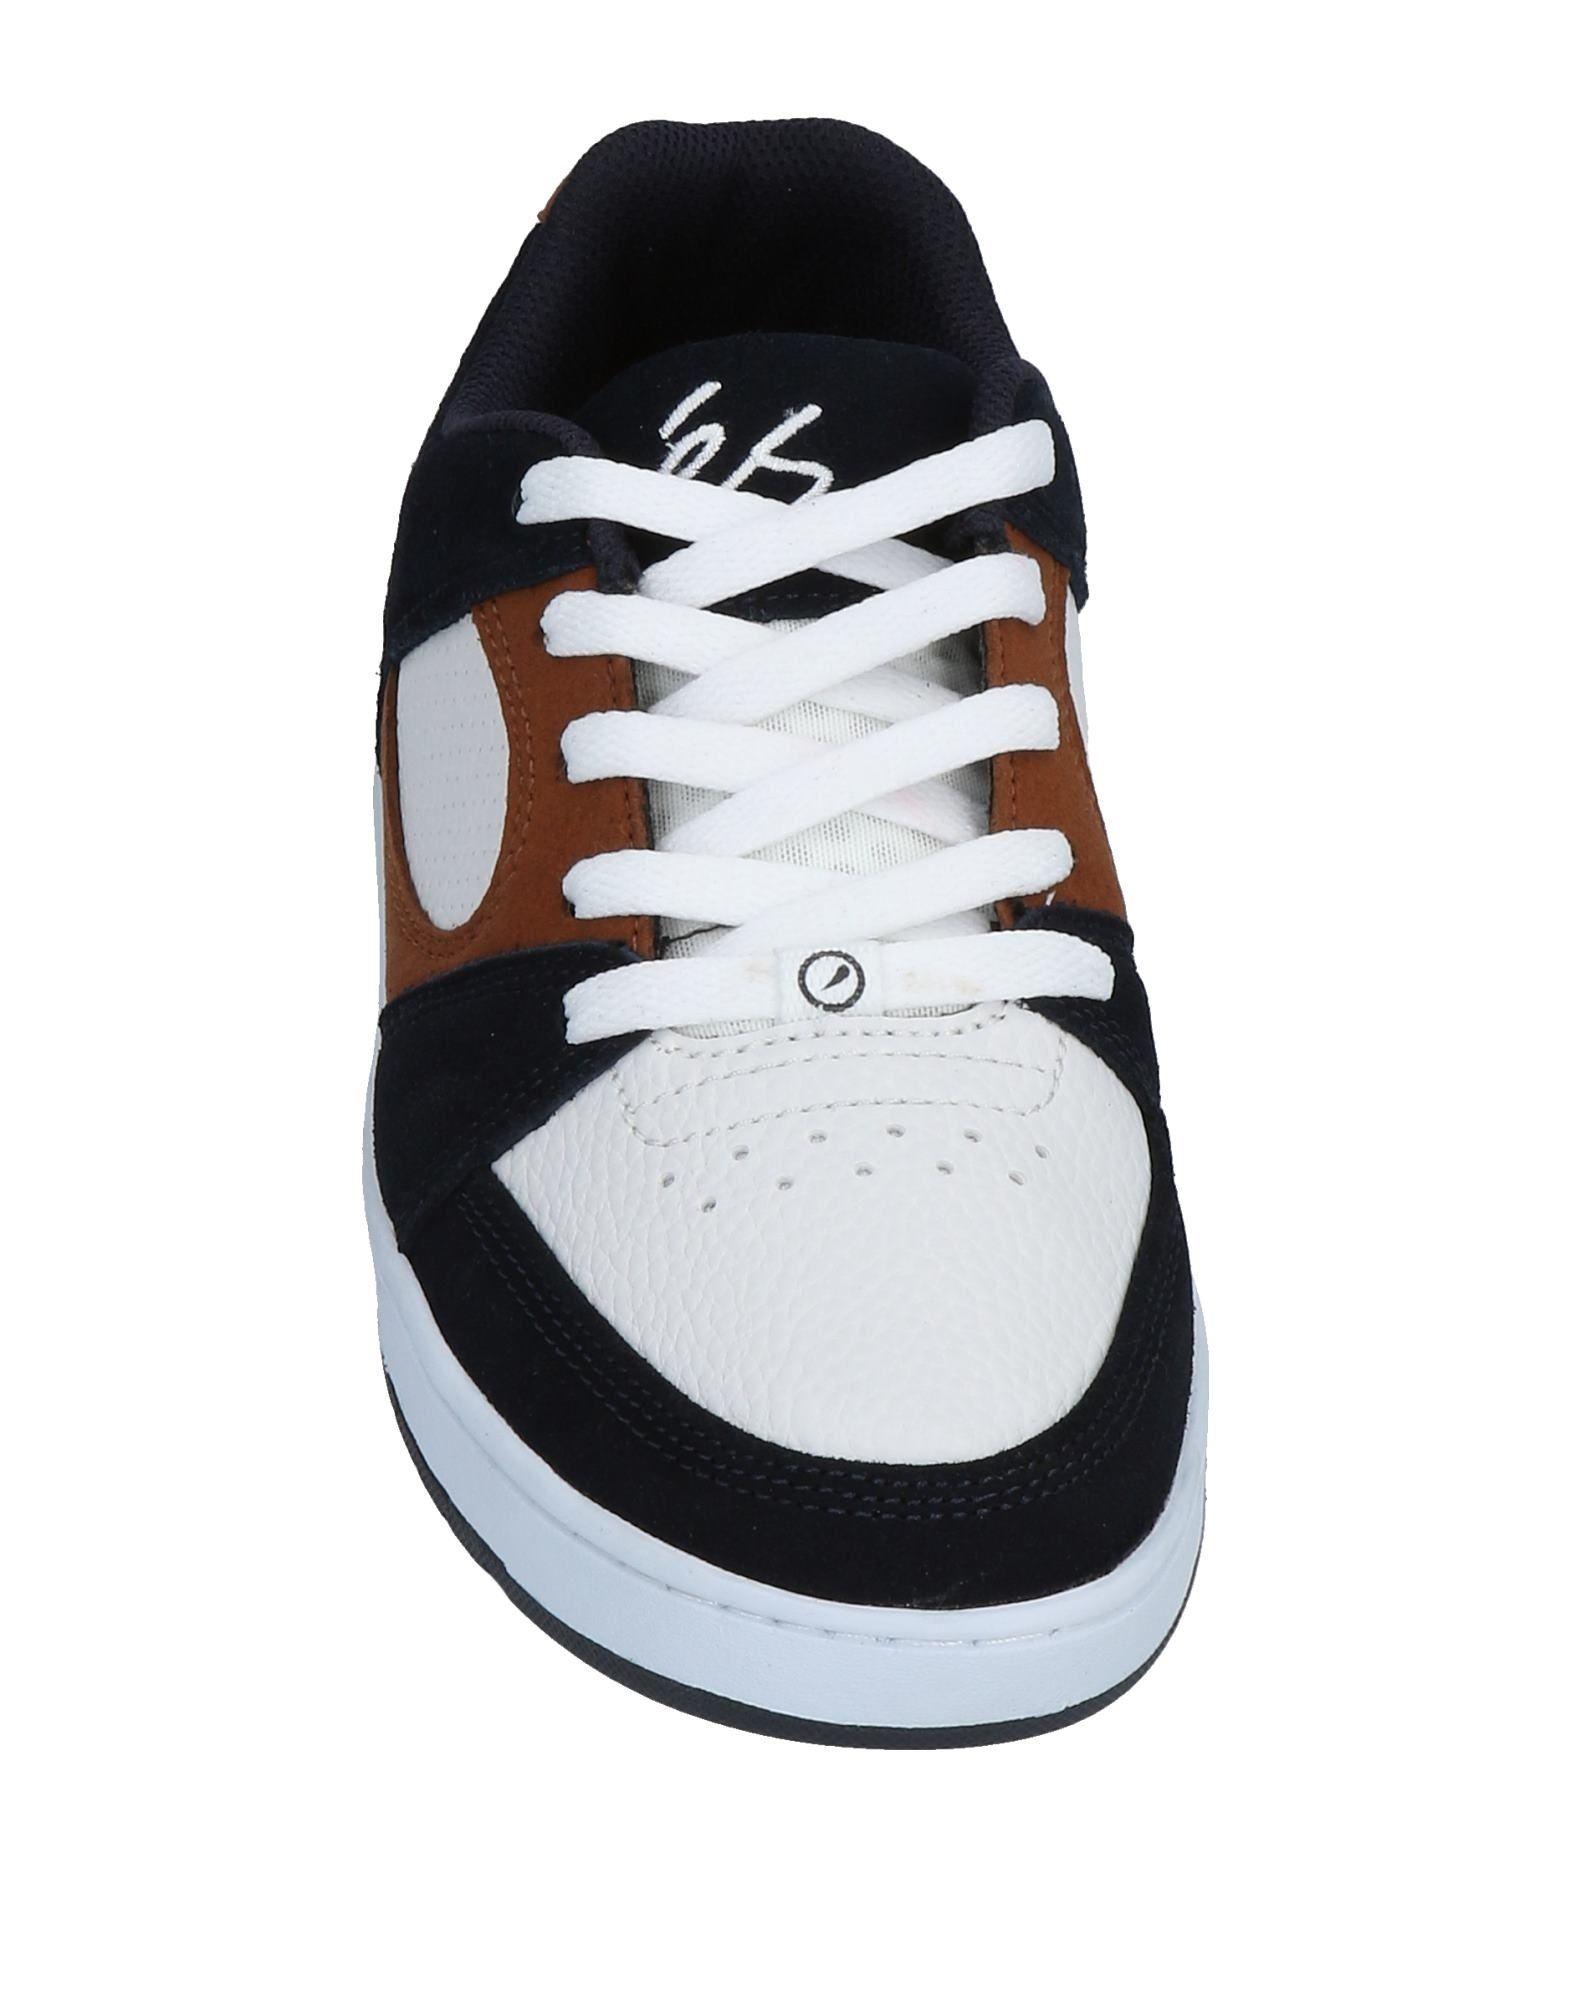 Moda Sneakers Sneakers Moda és Uomo - 11473758TJ 0bea9f